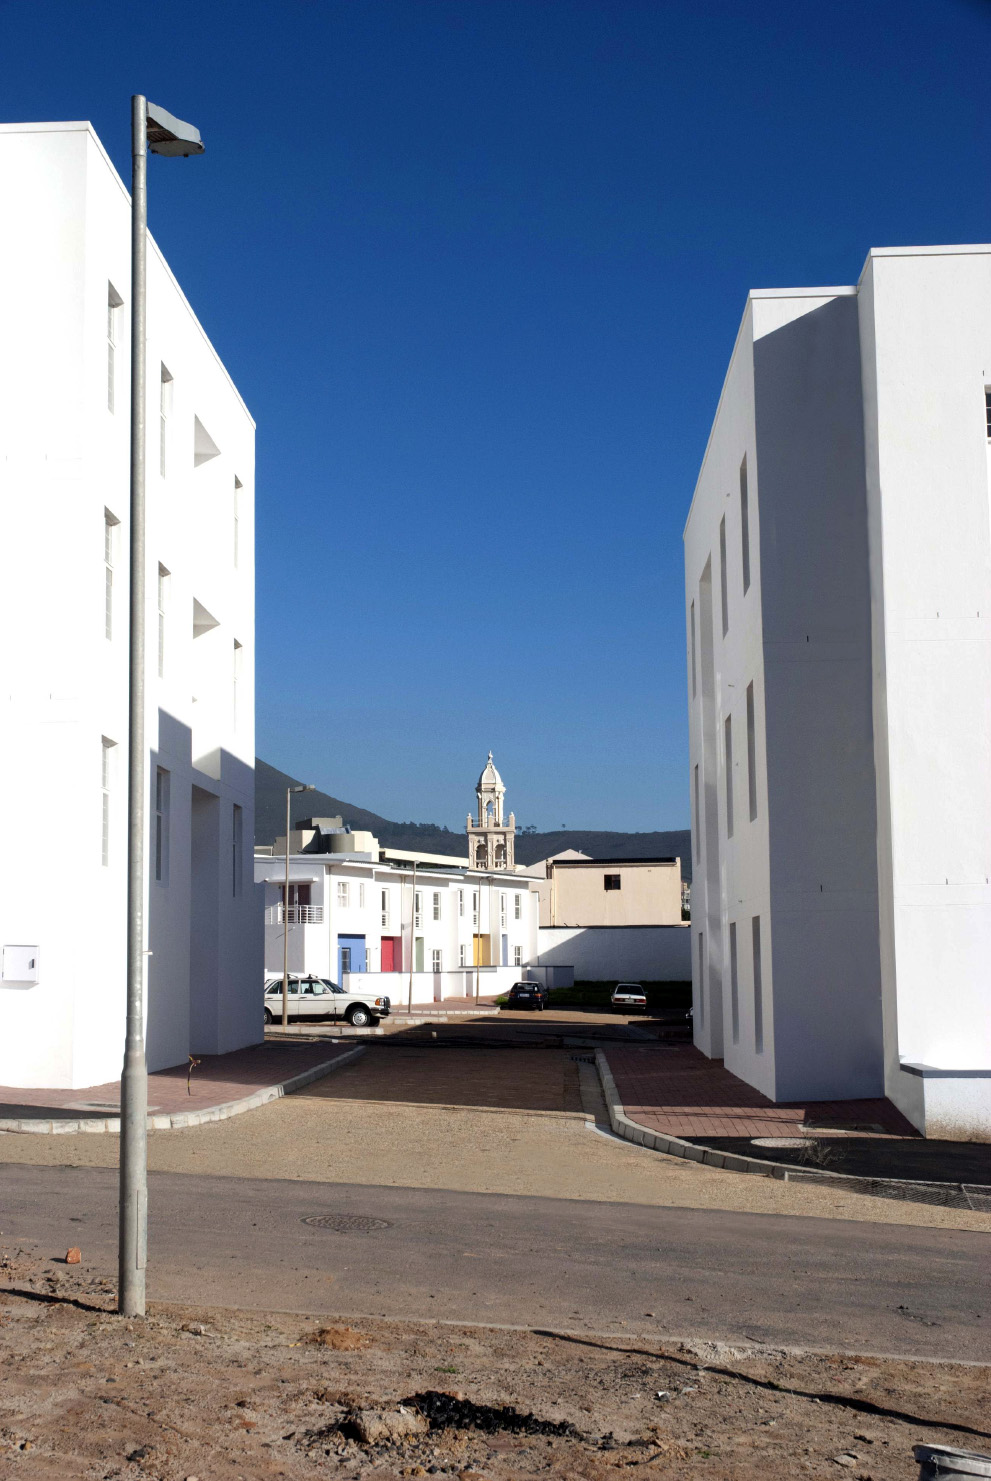 view towards al azhar mosque and aspeling street